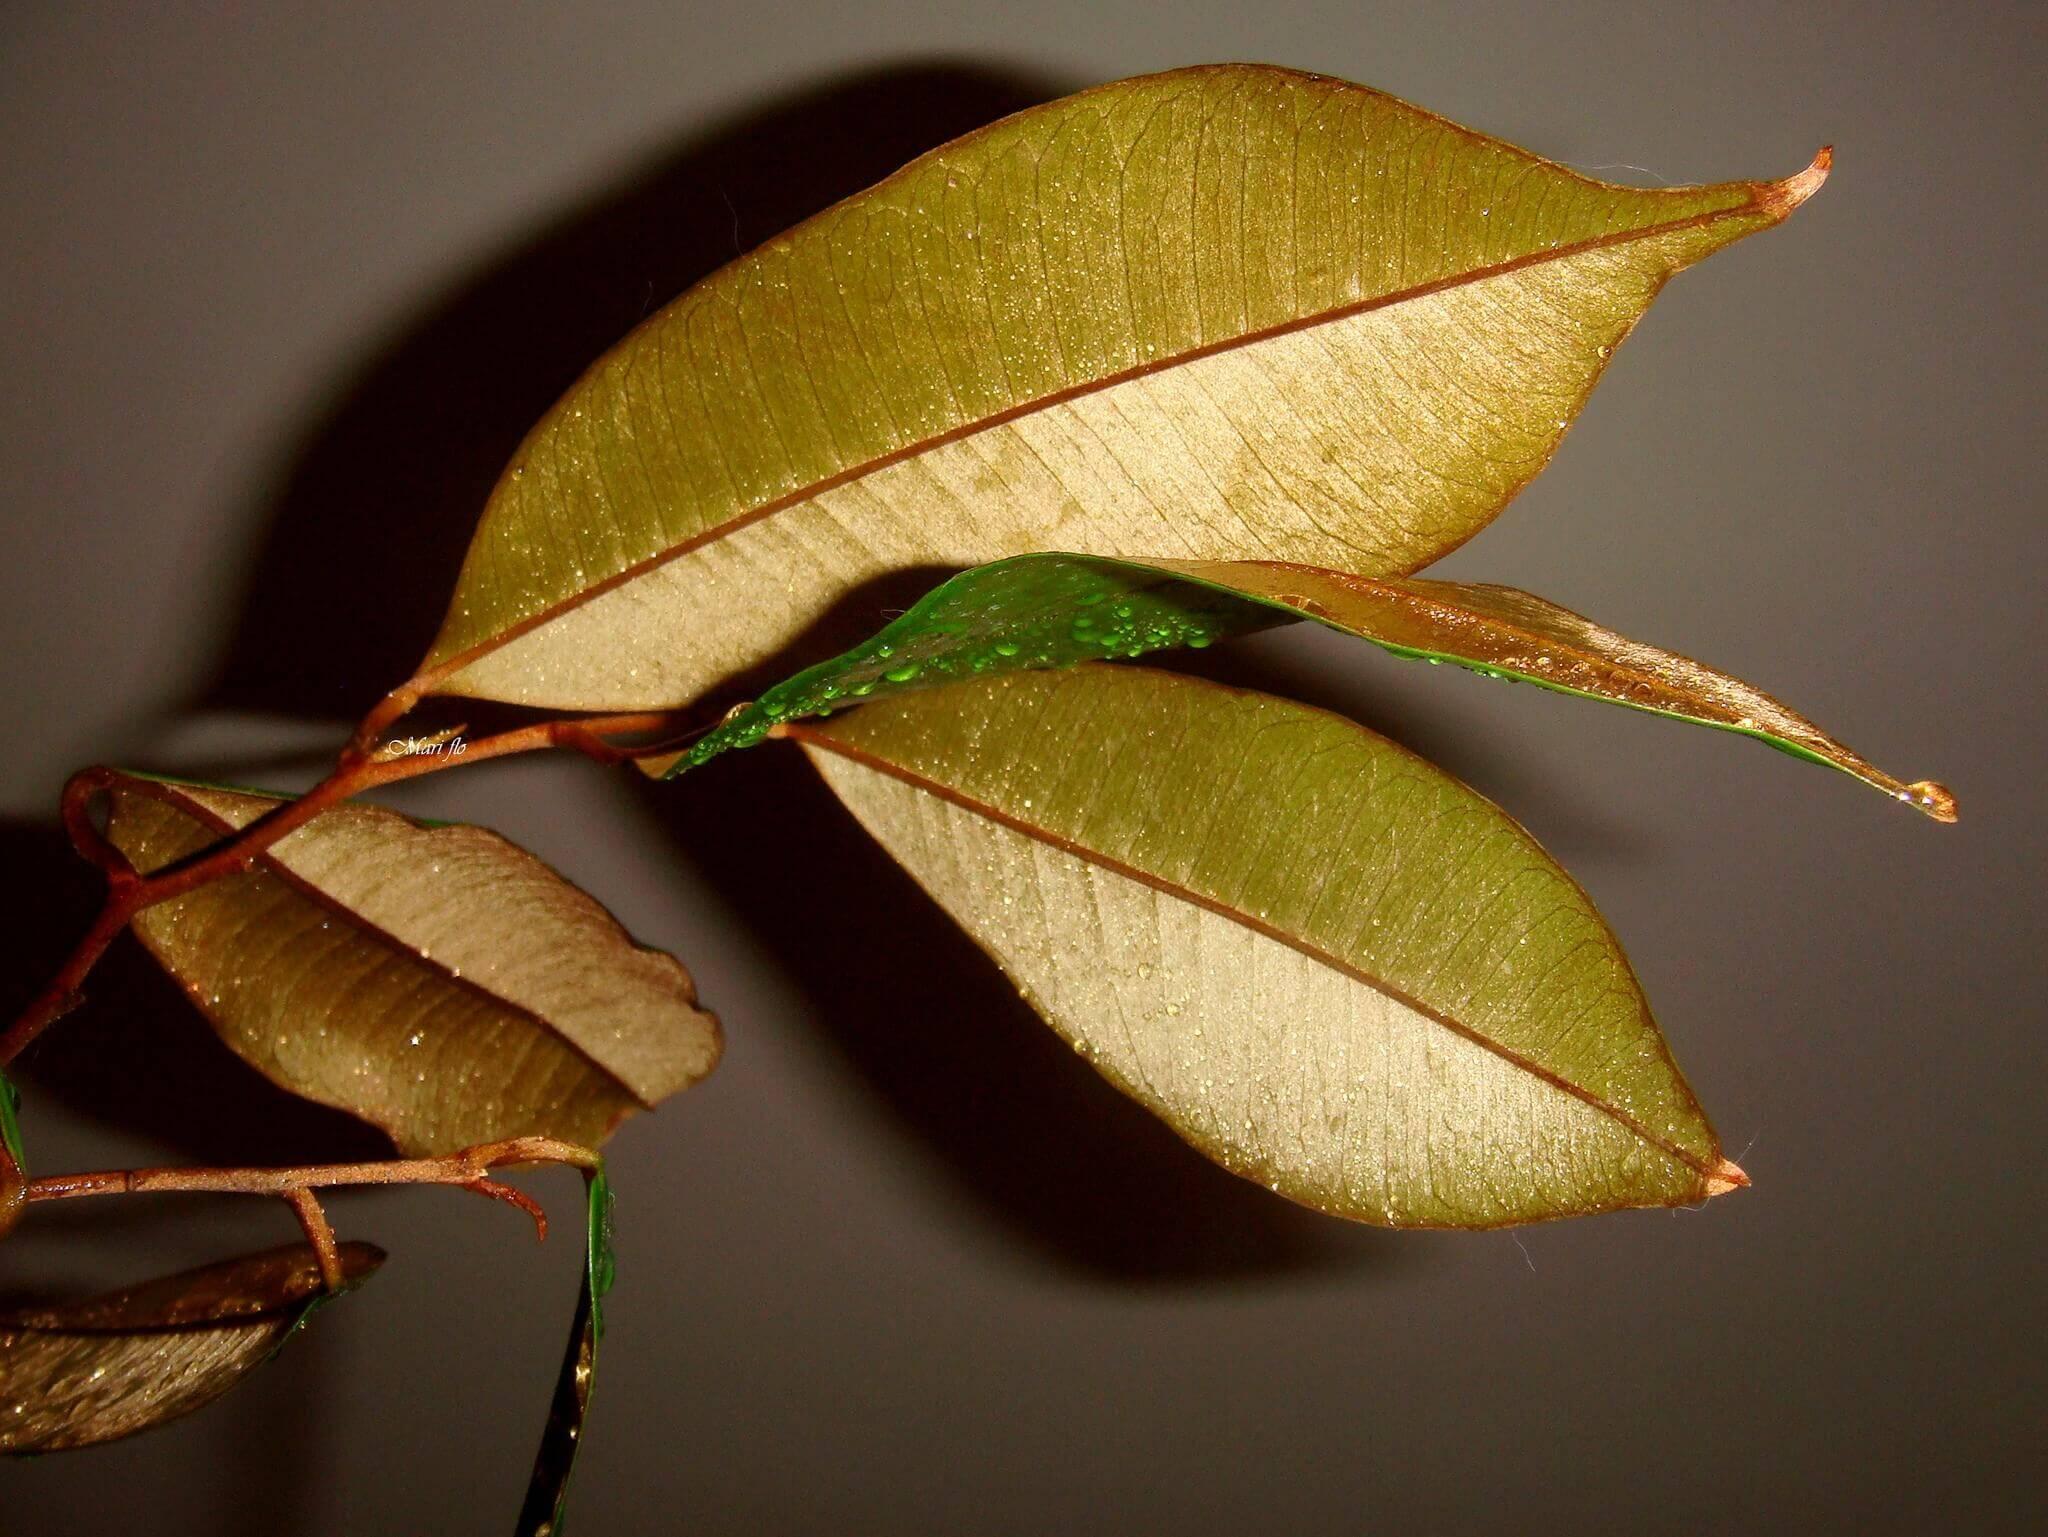 chrysophyllum cainito Define chrysophyllum cainito chrysophyllum cainito synonyms, chrysophyllum cainito pronunciation, chrysophyllum cainito translation, english dictionary definition of chrysophyllum cainito.